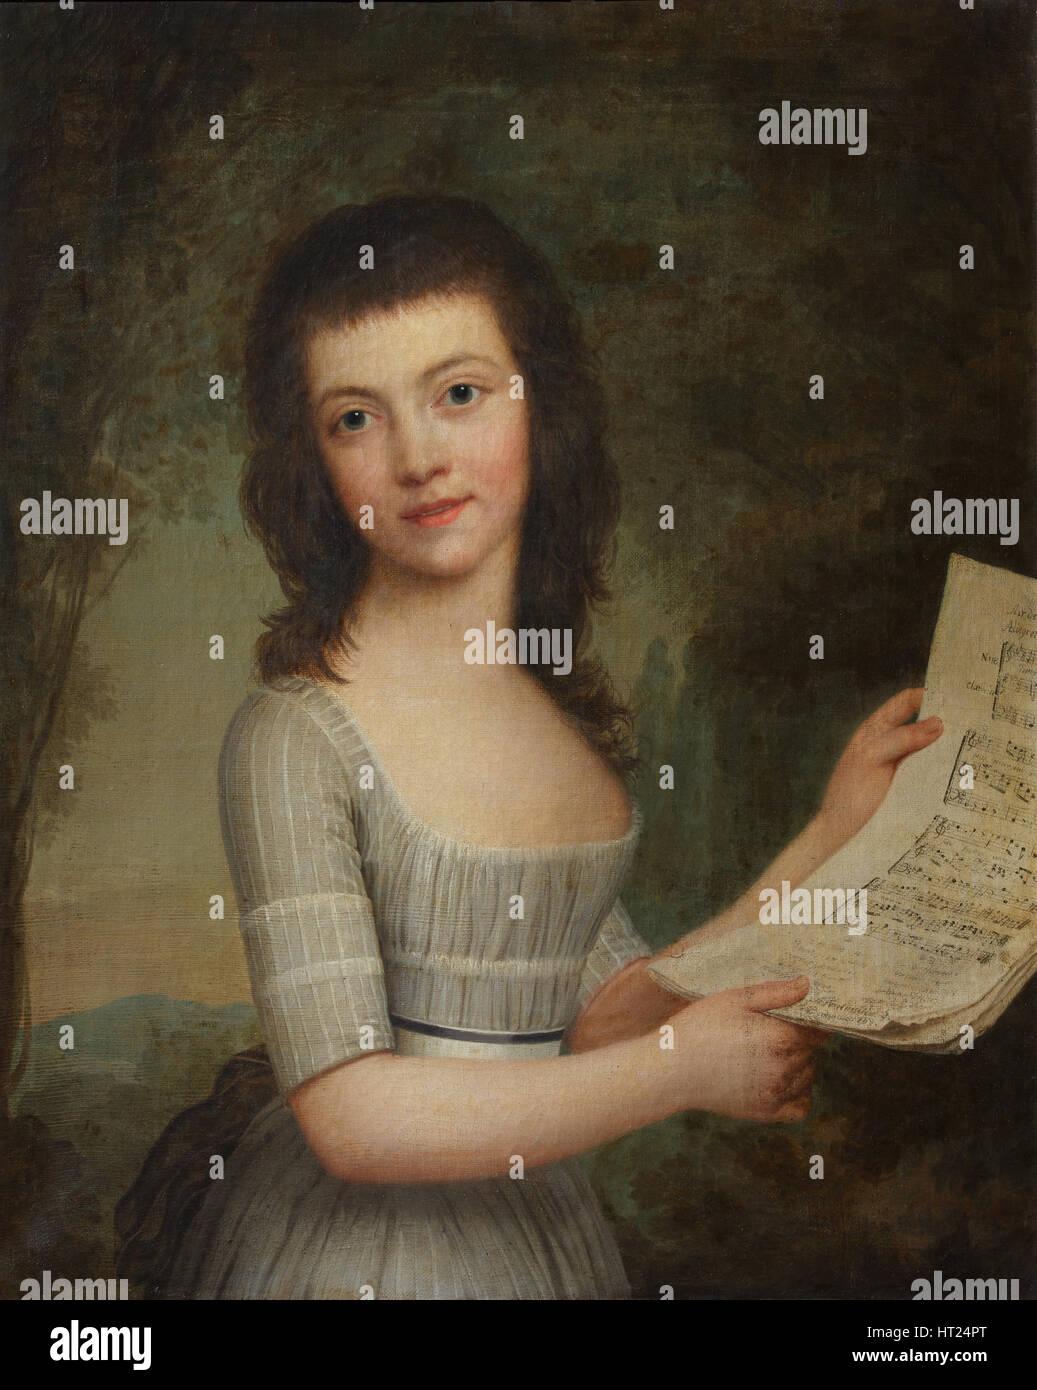 Portrait of Mademoiselle Wittfooth, 1789. Artist: Wertmüller, Adolf Ulrik (1751-1811) - Stock Image